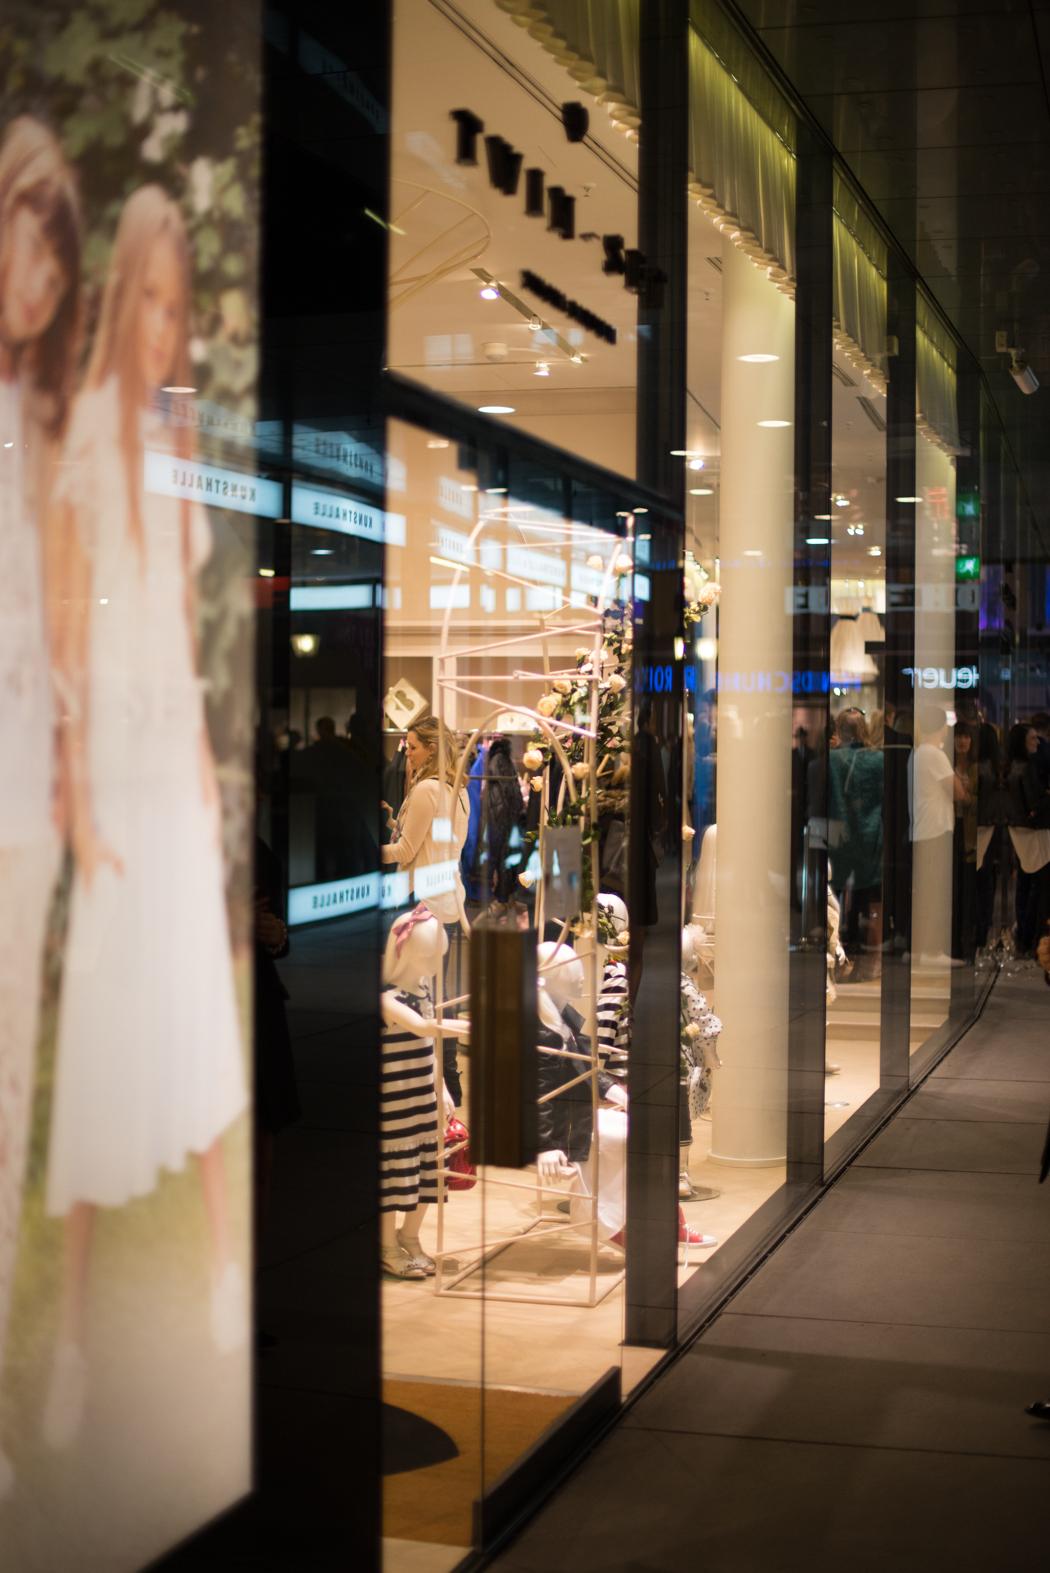 Twin-Set-Opening-München-Store-Munich-Monaco-Simona-Barbieri-Fashionblogger-München-Fashionblog-Deutschland-Blog-Lifestyle-Lindarella-14